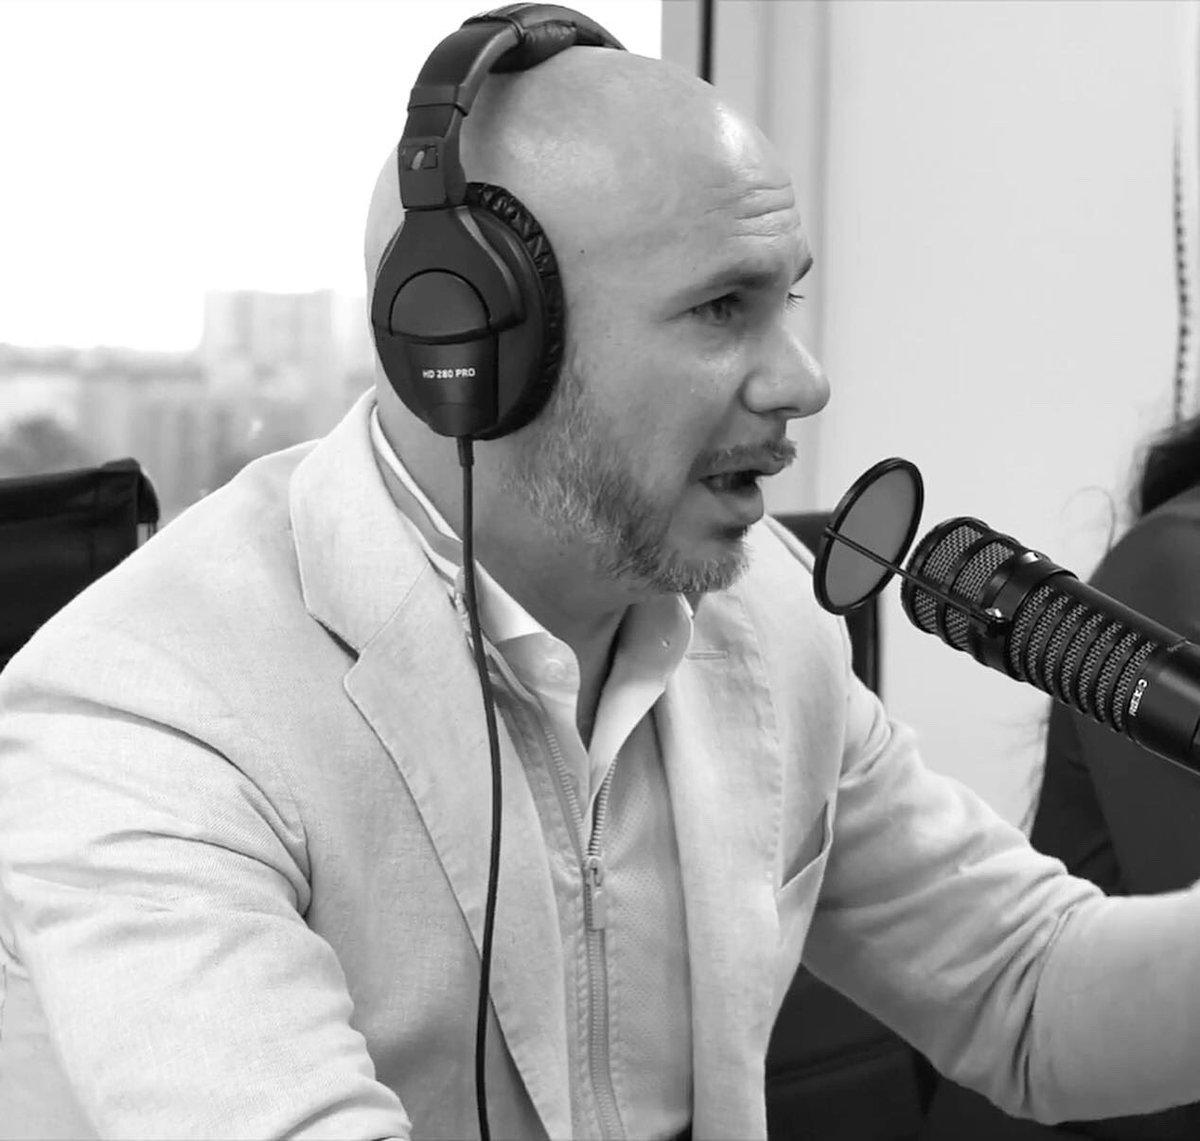 📸 @Pitbull — #FromNegativeToPositive #MrWorldwide #Pitbull